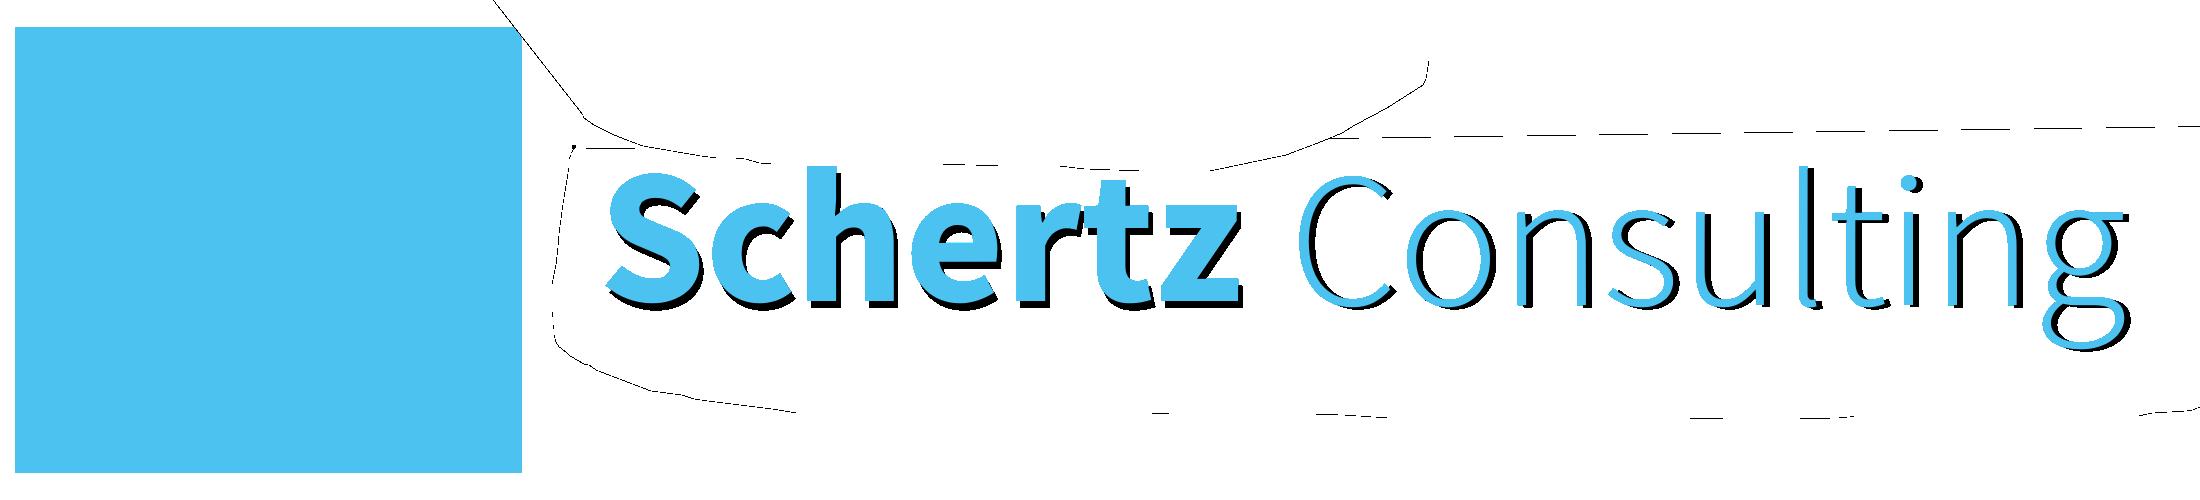 Schertz Consulting